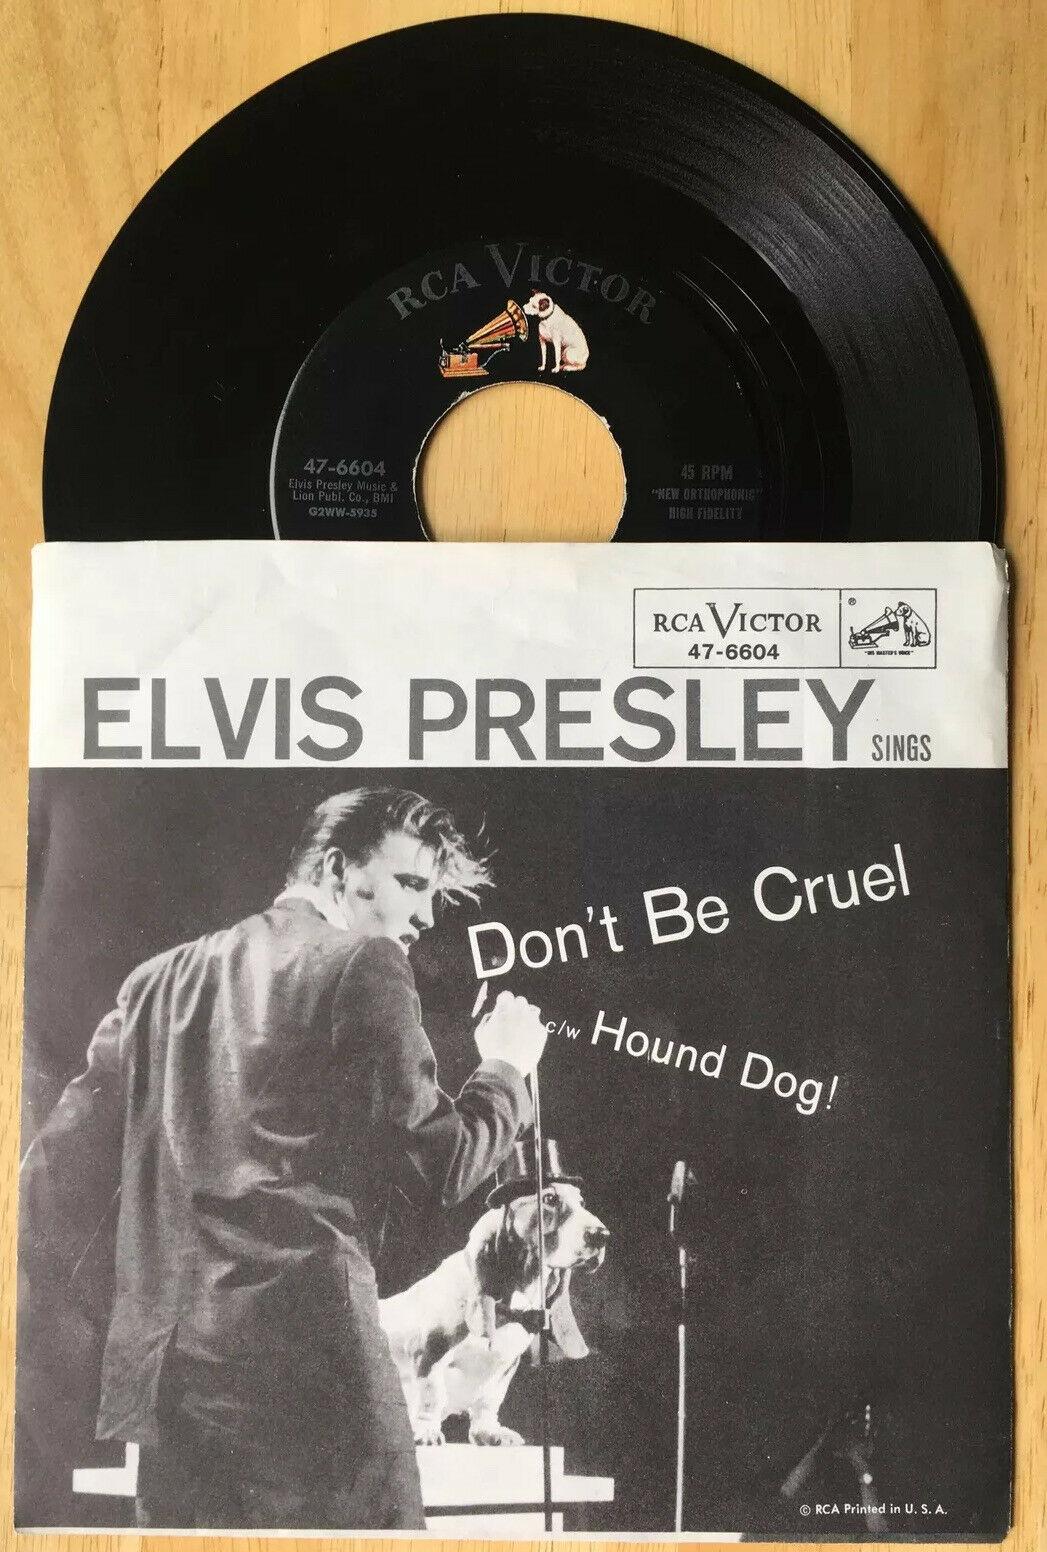 "Elvis Presley -Don't Be Cruel / Hound Dog RCA Victor 47-6604 7"" 45RPM w/sleeve"